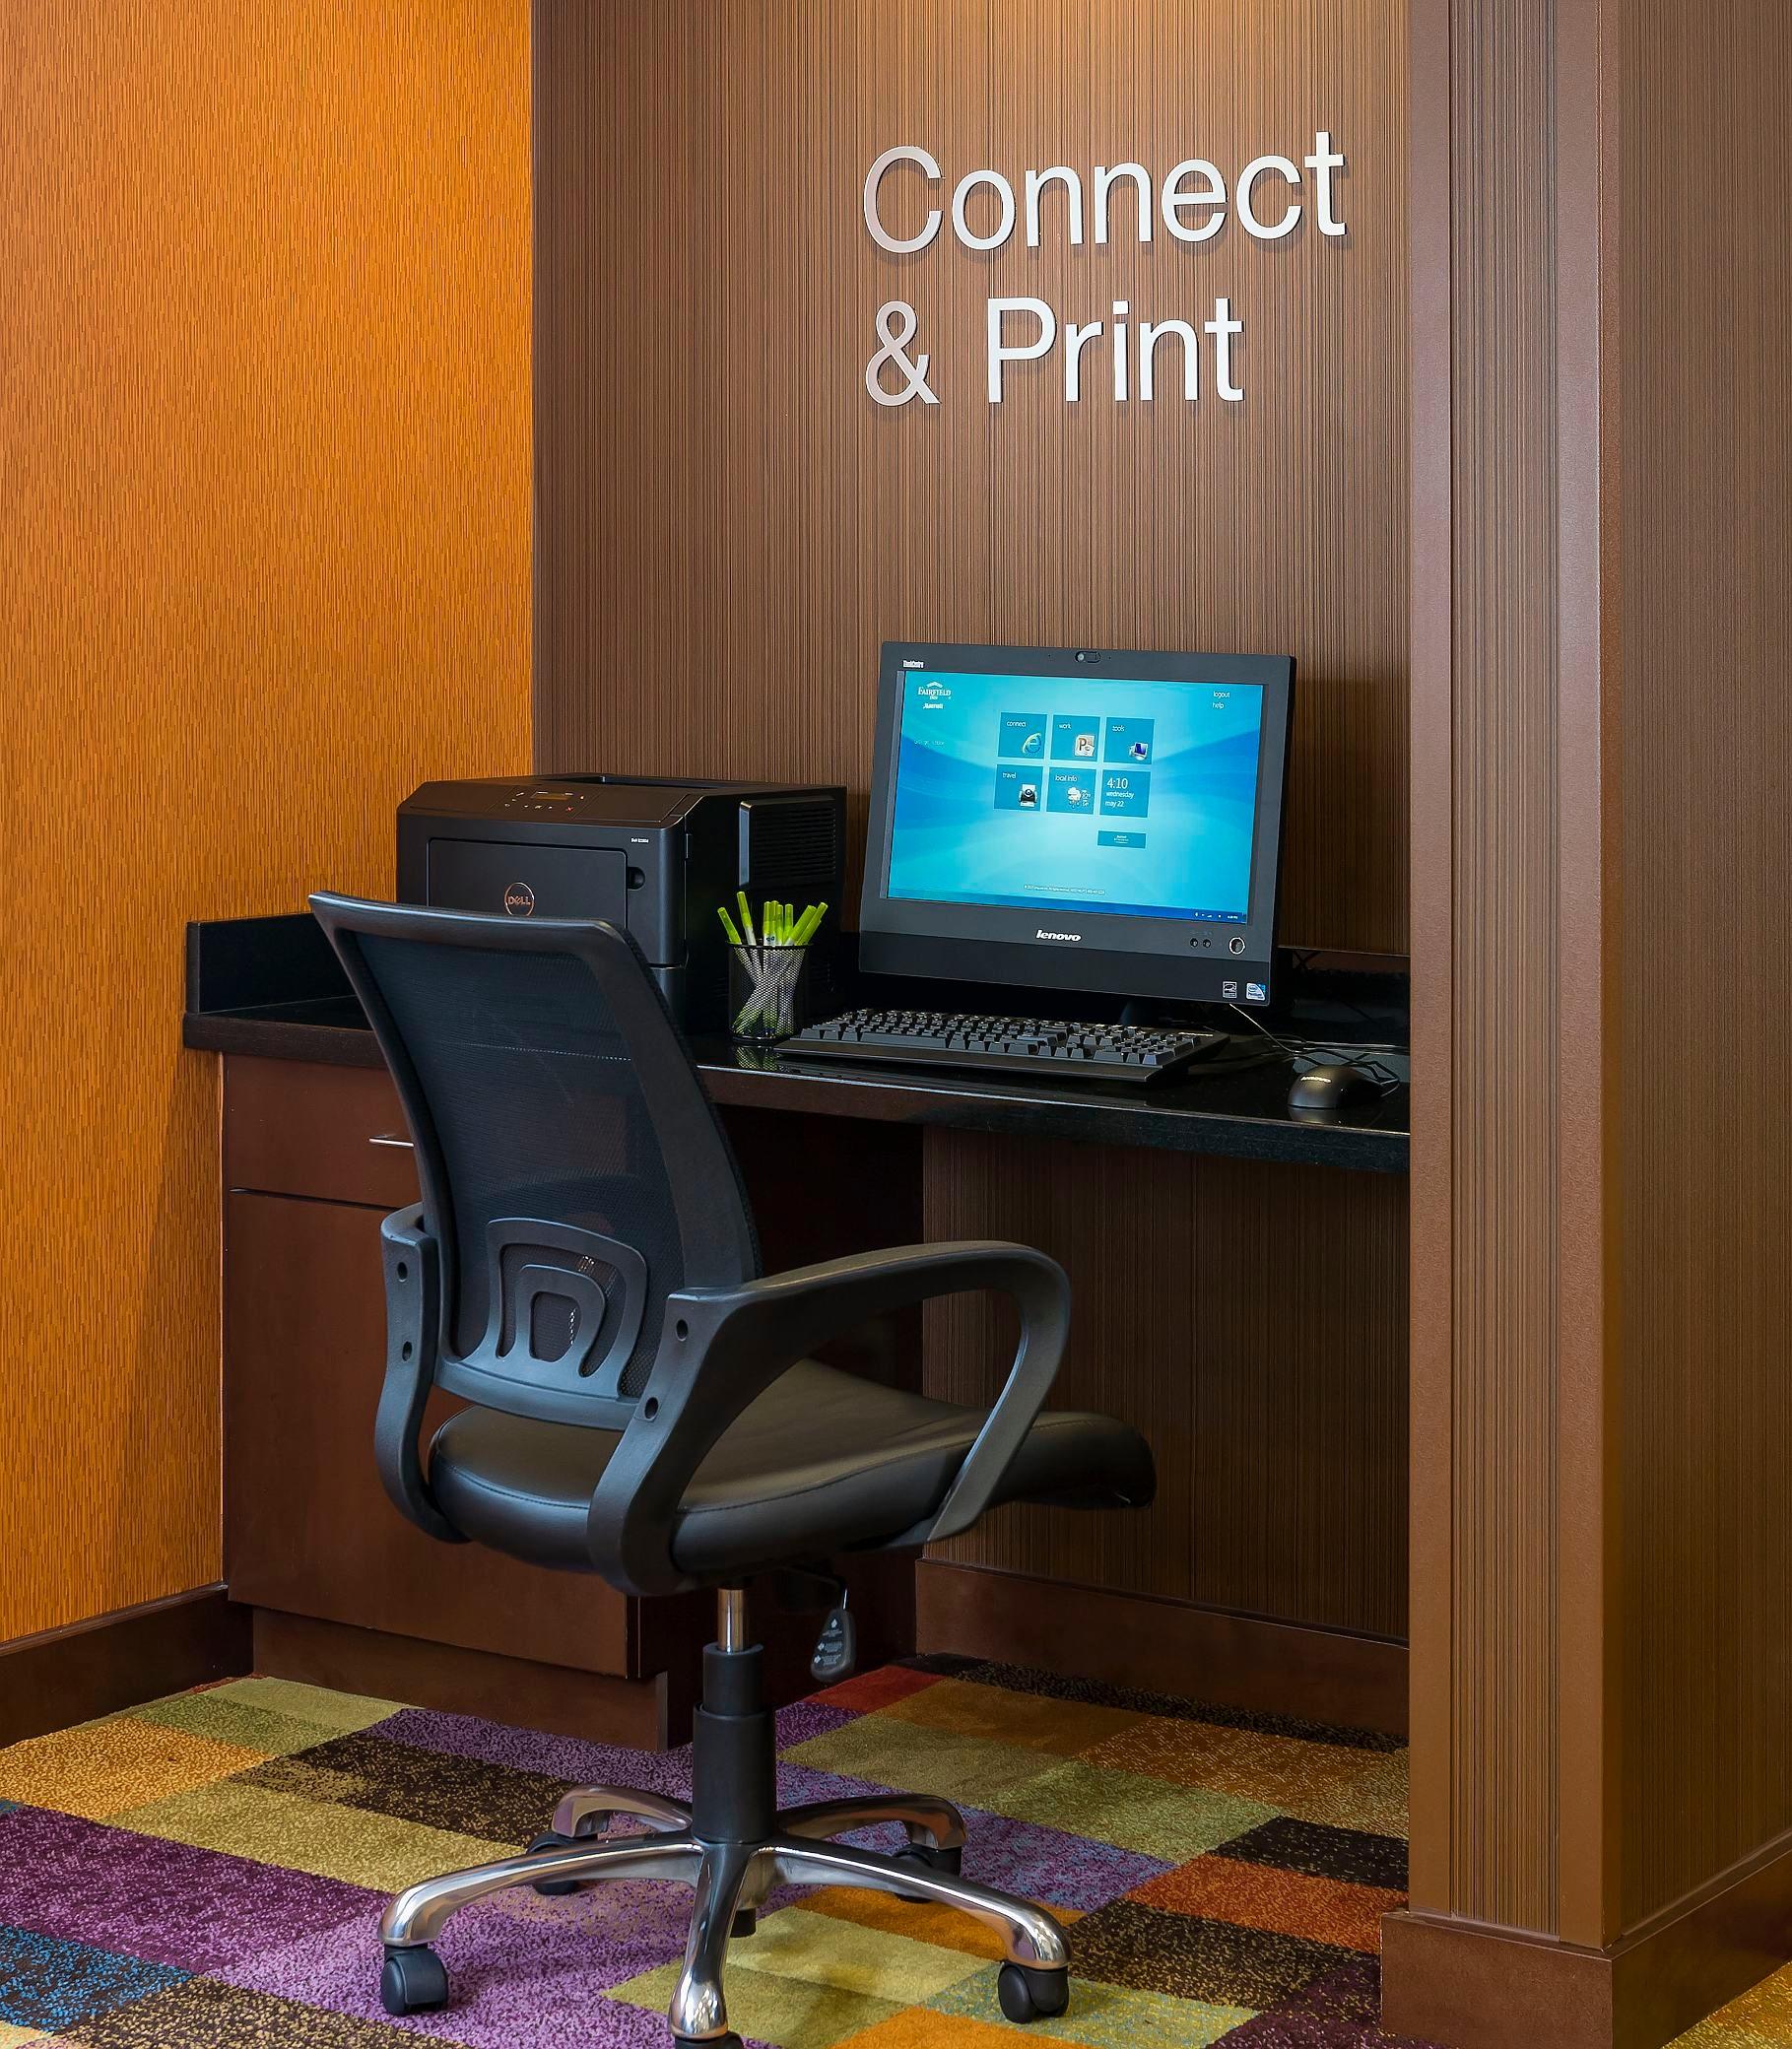 Fairfield Inn & Suites by Marriott Jackson image 17